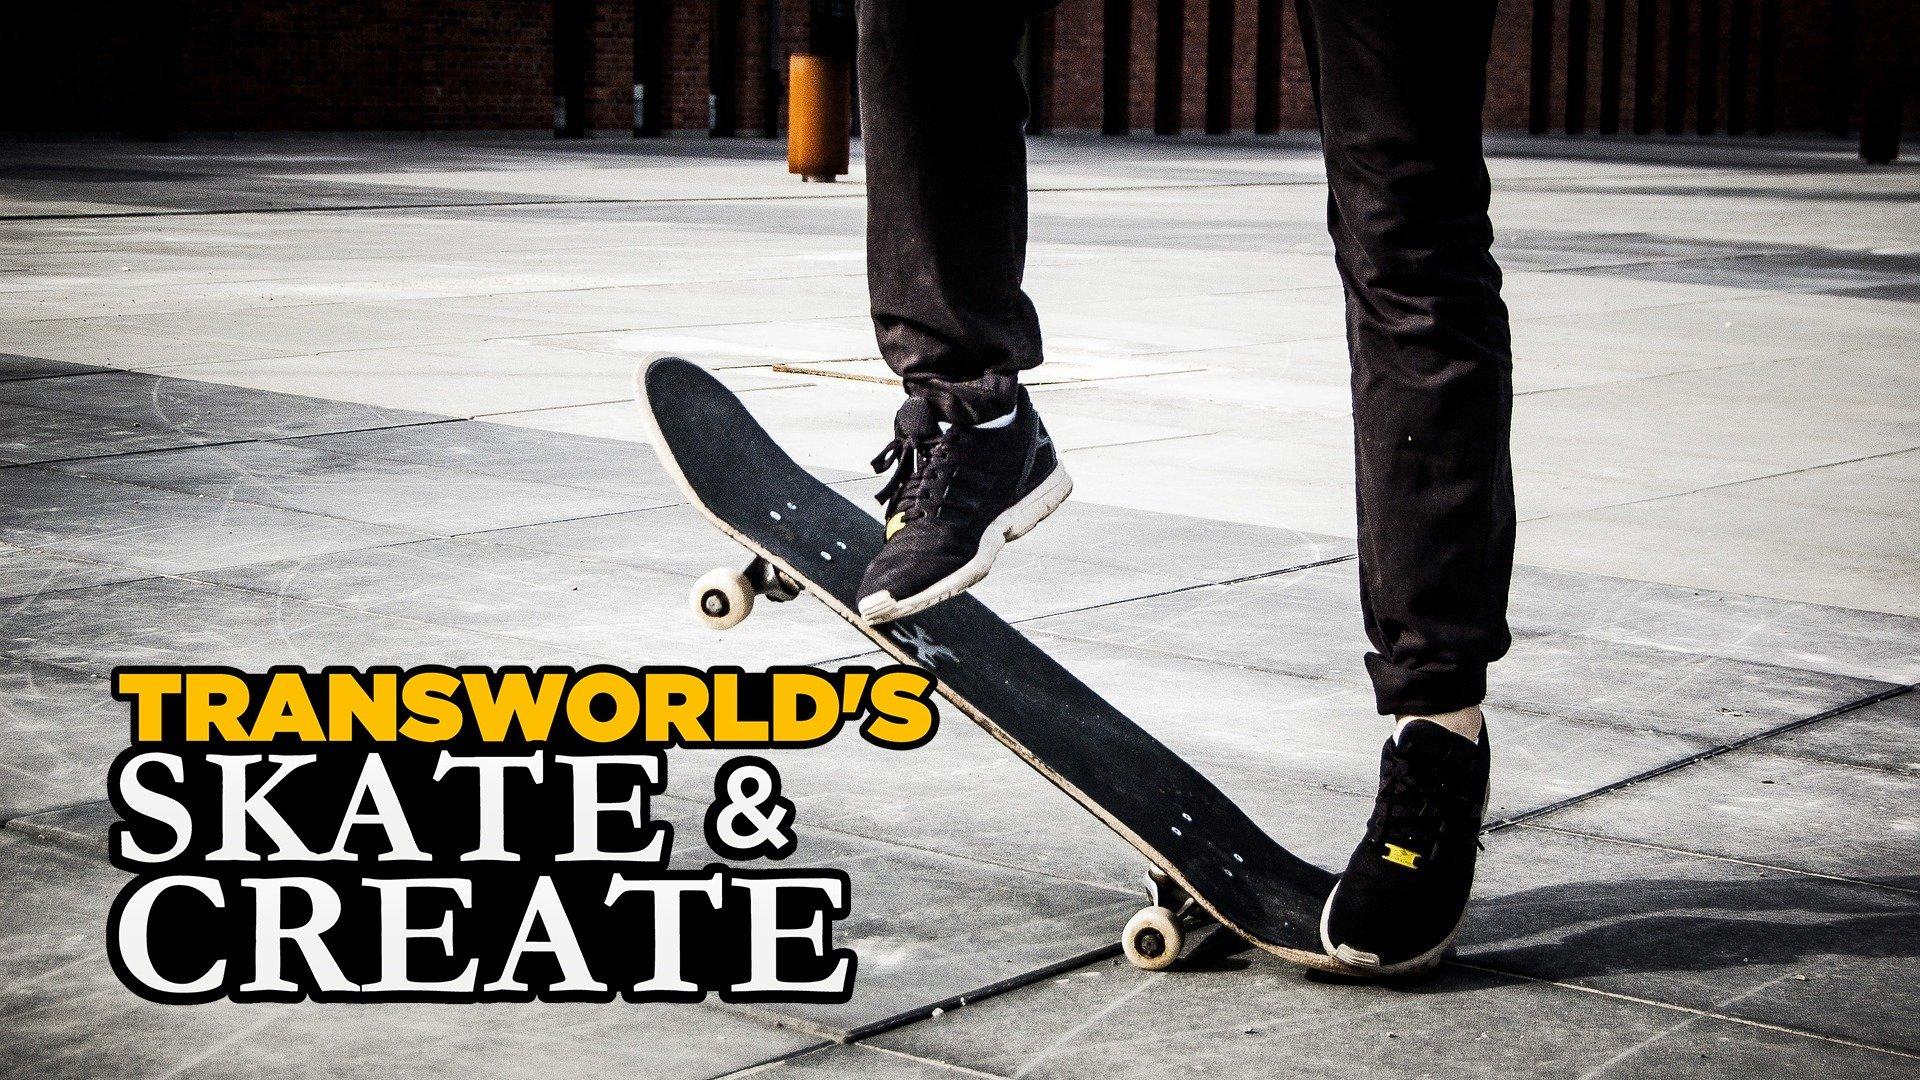 Transworld's Skate & Create